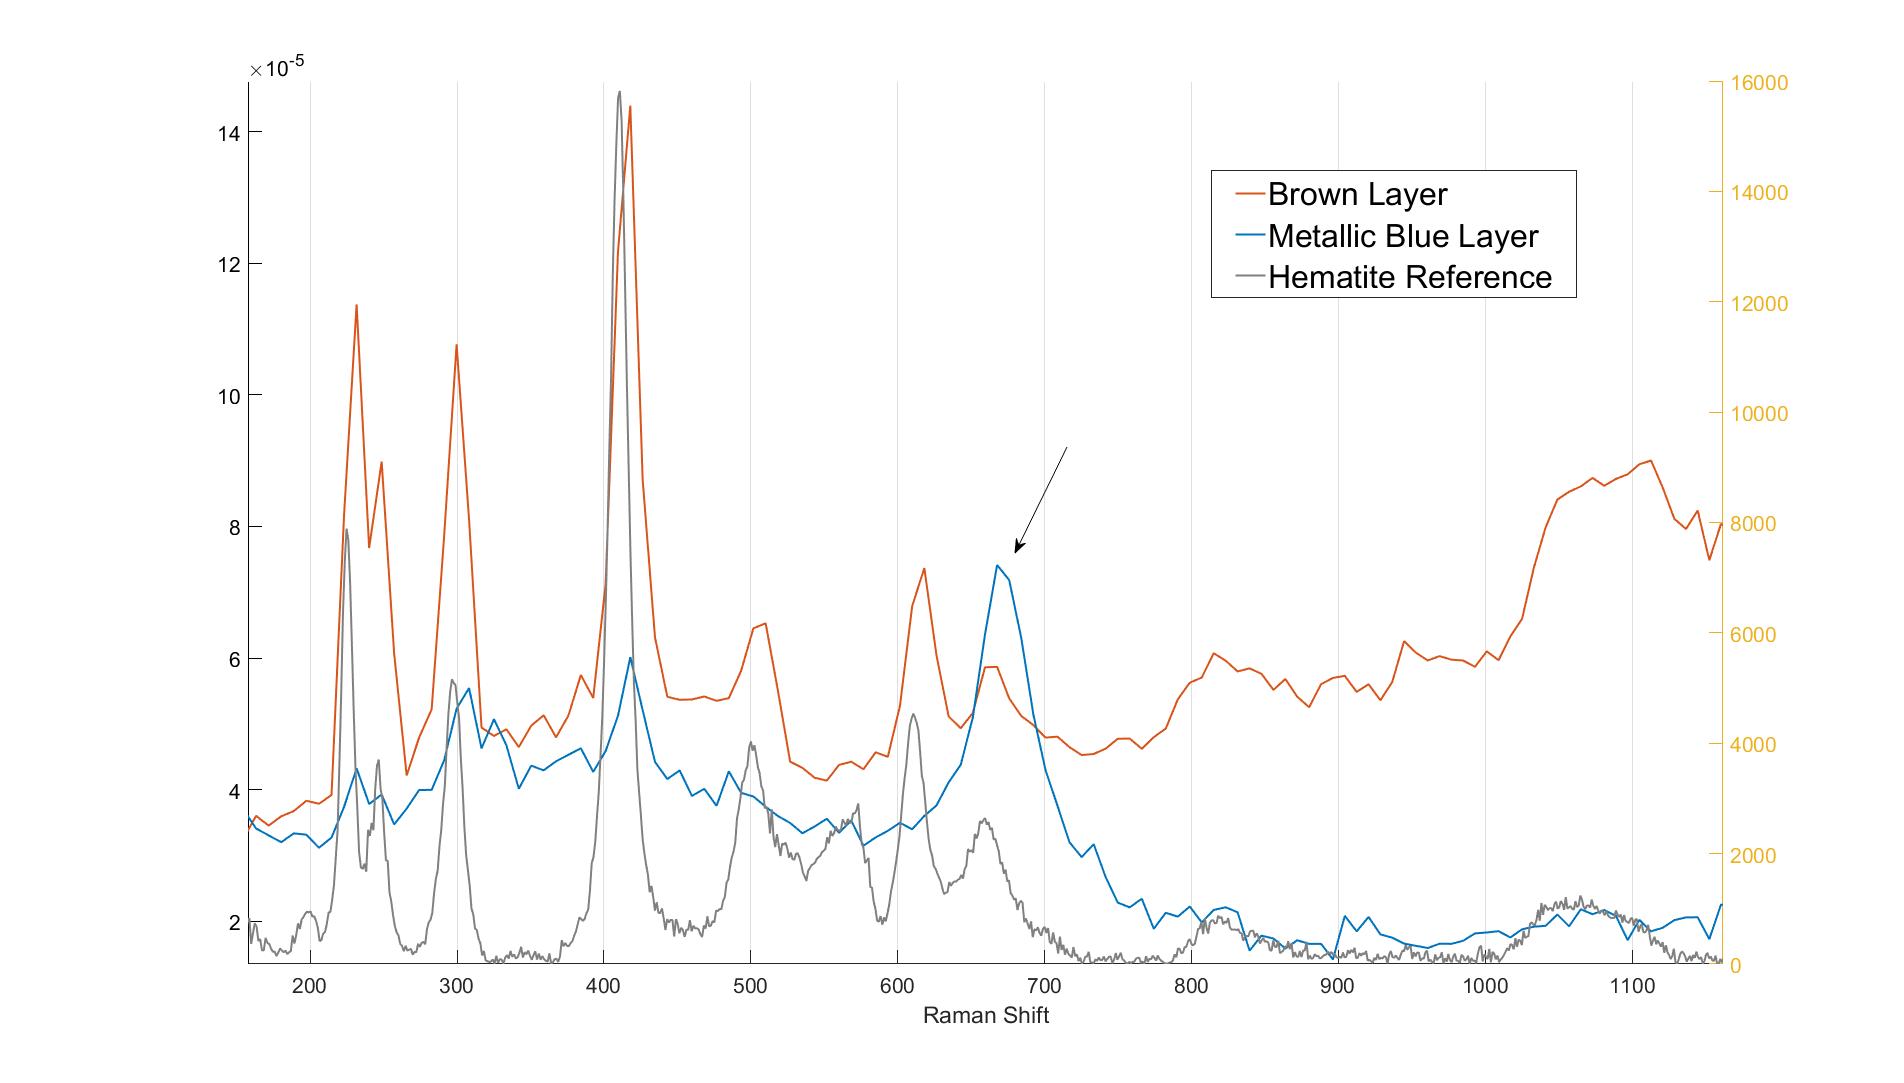 2_compared_spectra